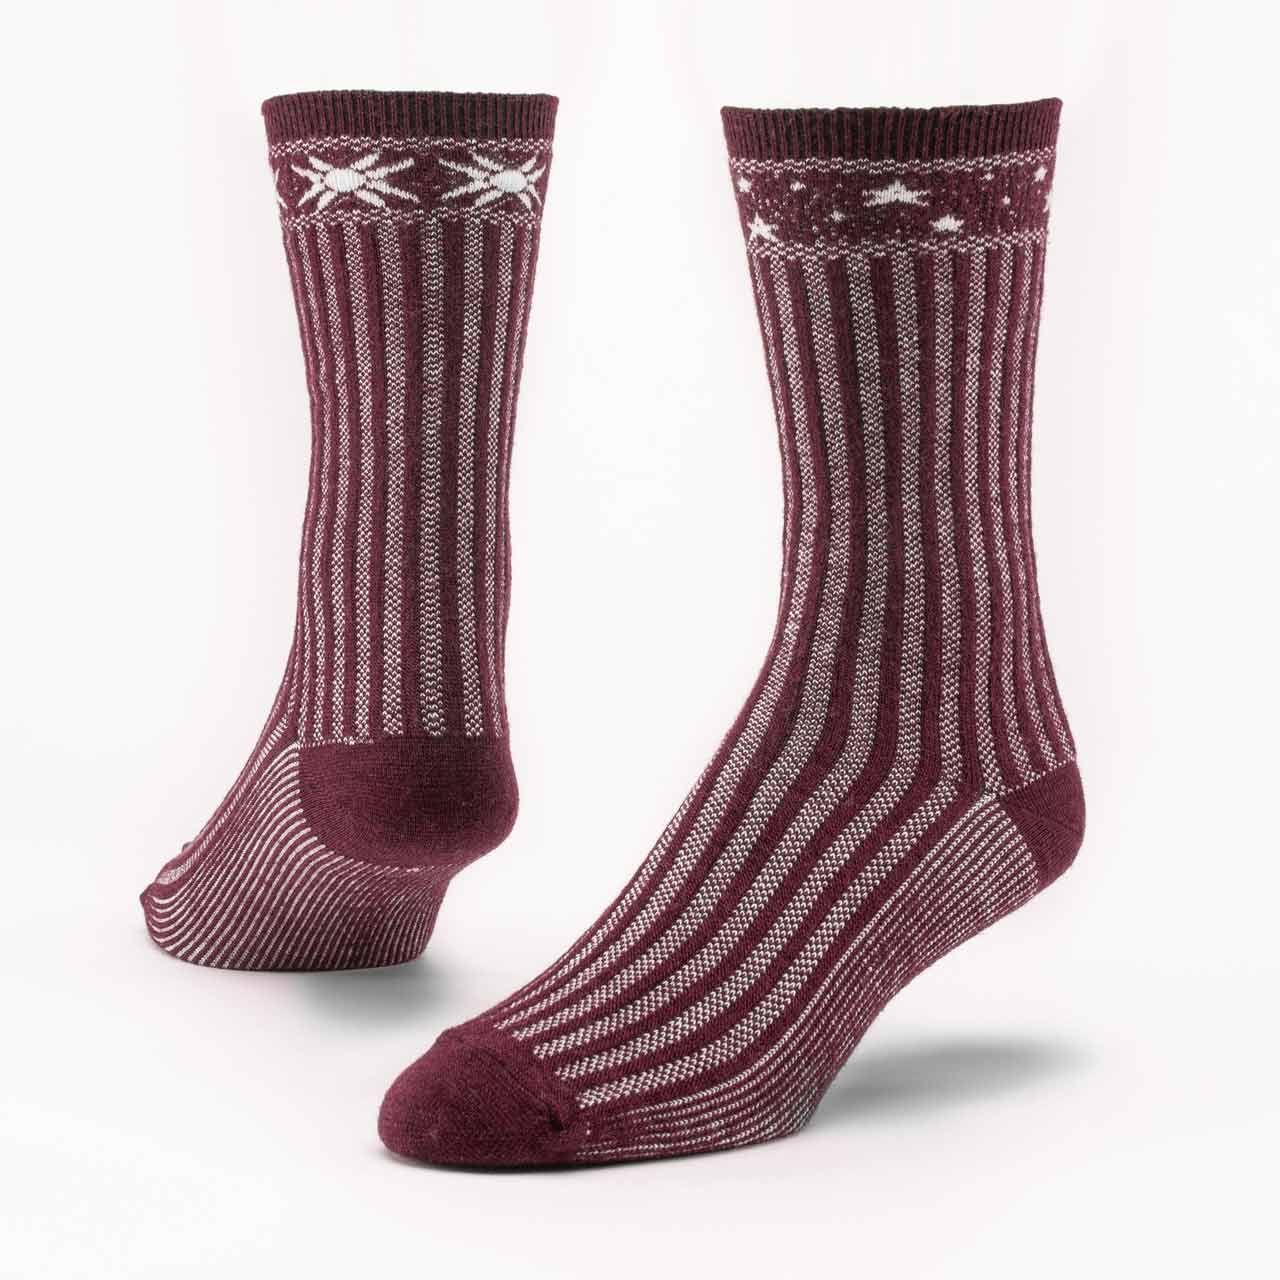 Maggie's Organics Organic Wool & Cotton Celestial Sweater Sock